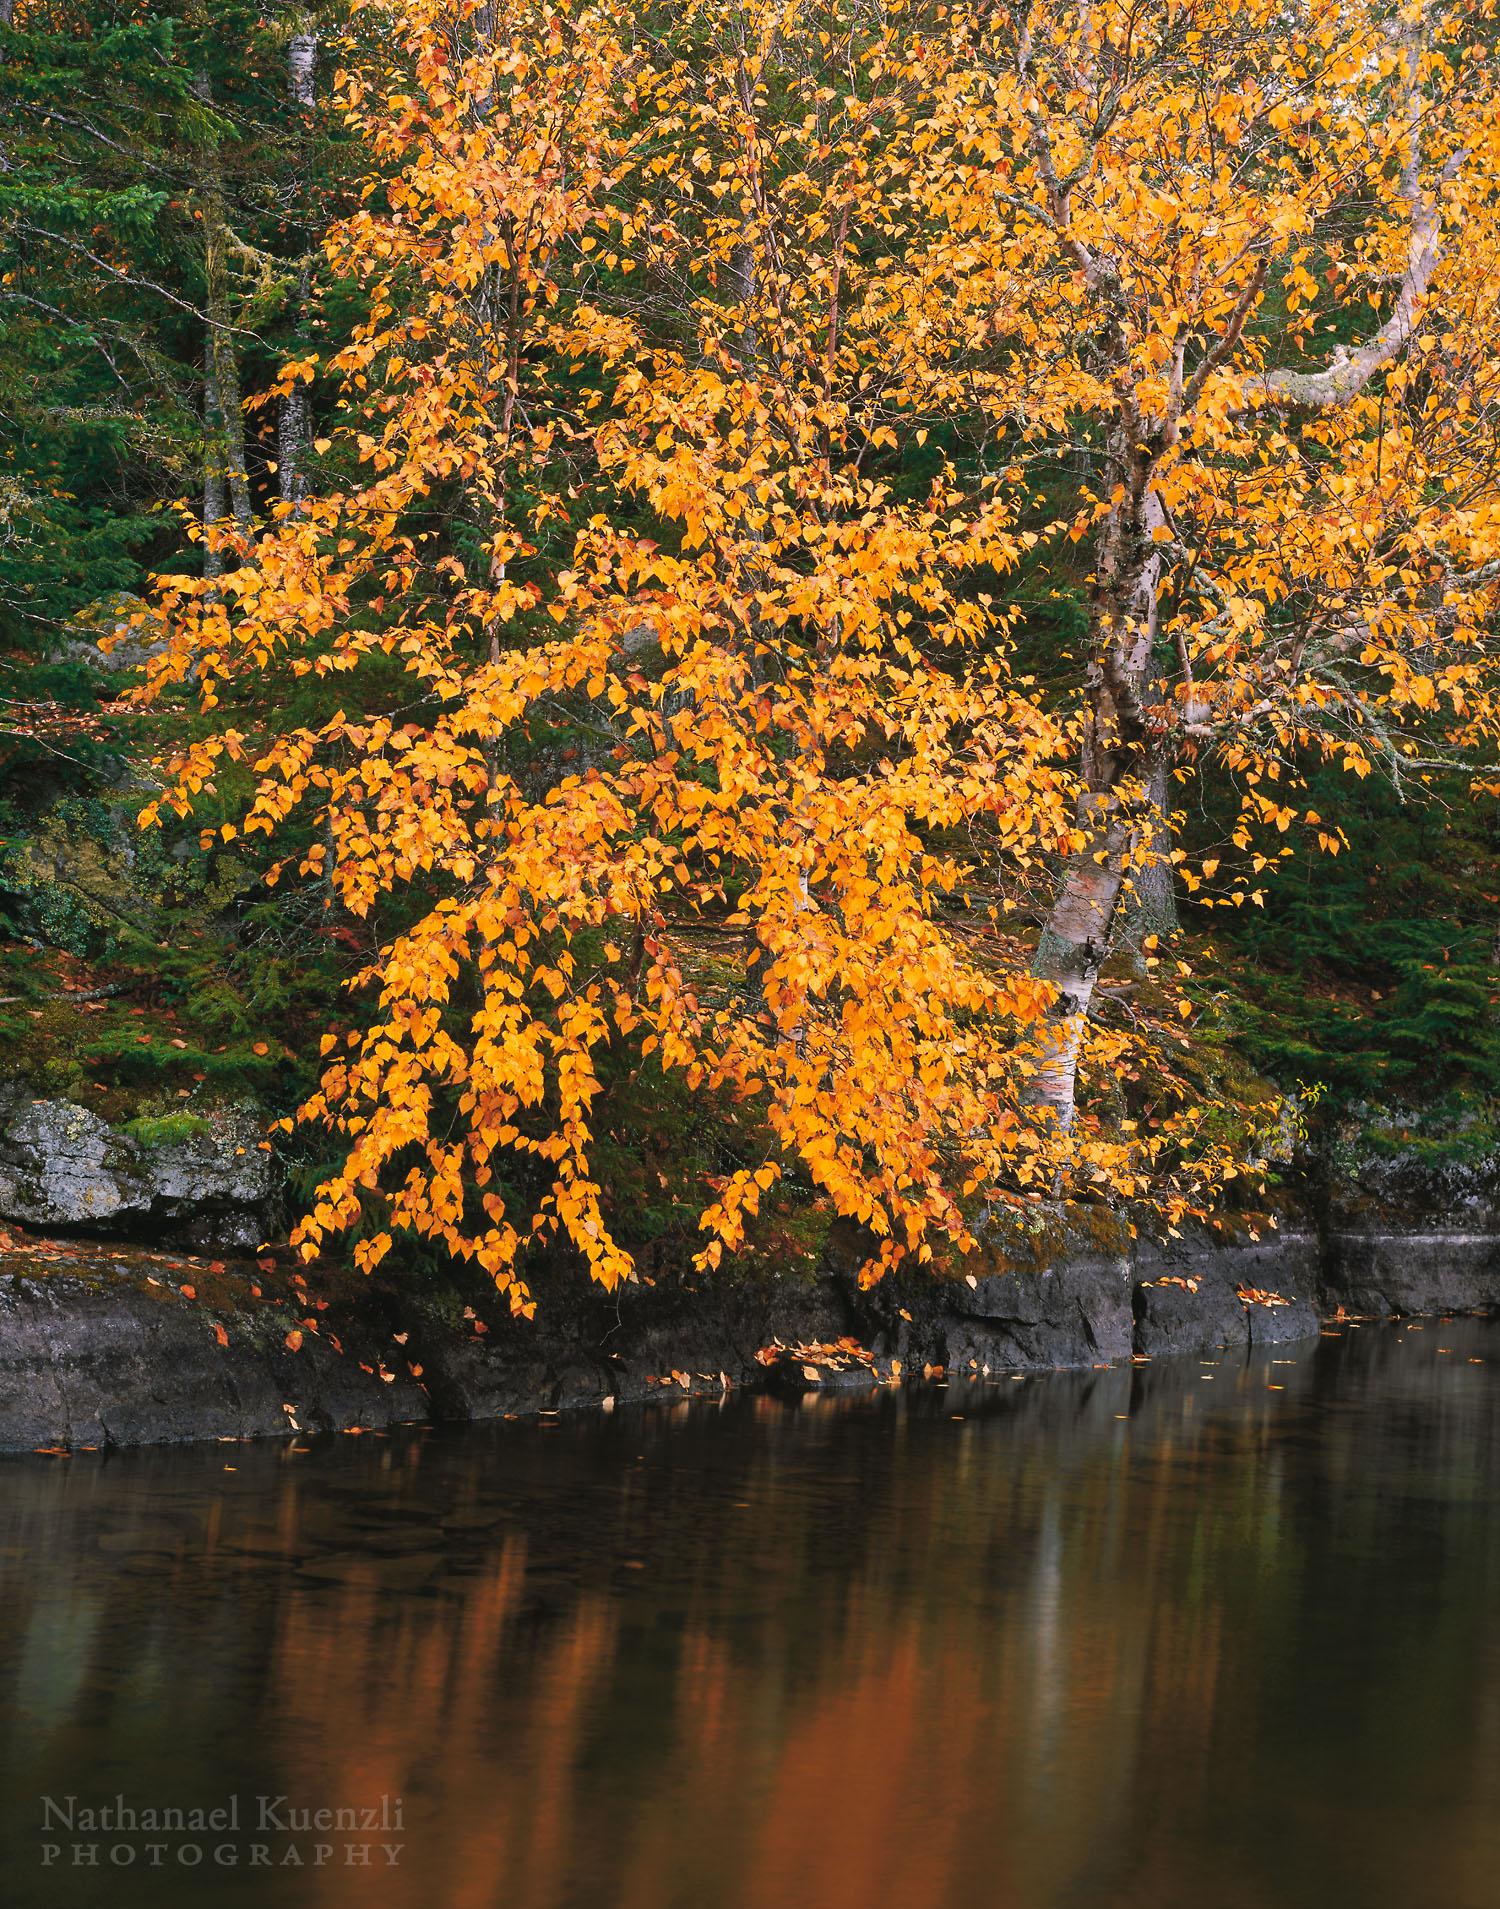 Cherokee Lake, Boundary Waters Canoe Area Wilderness, Minnesota, October 2005